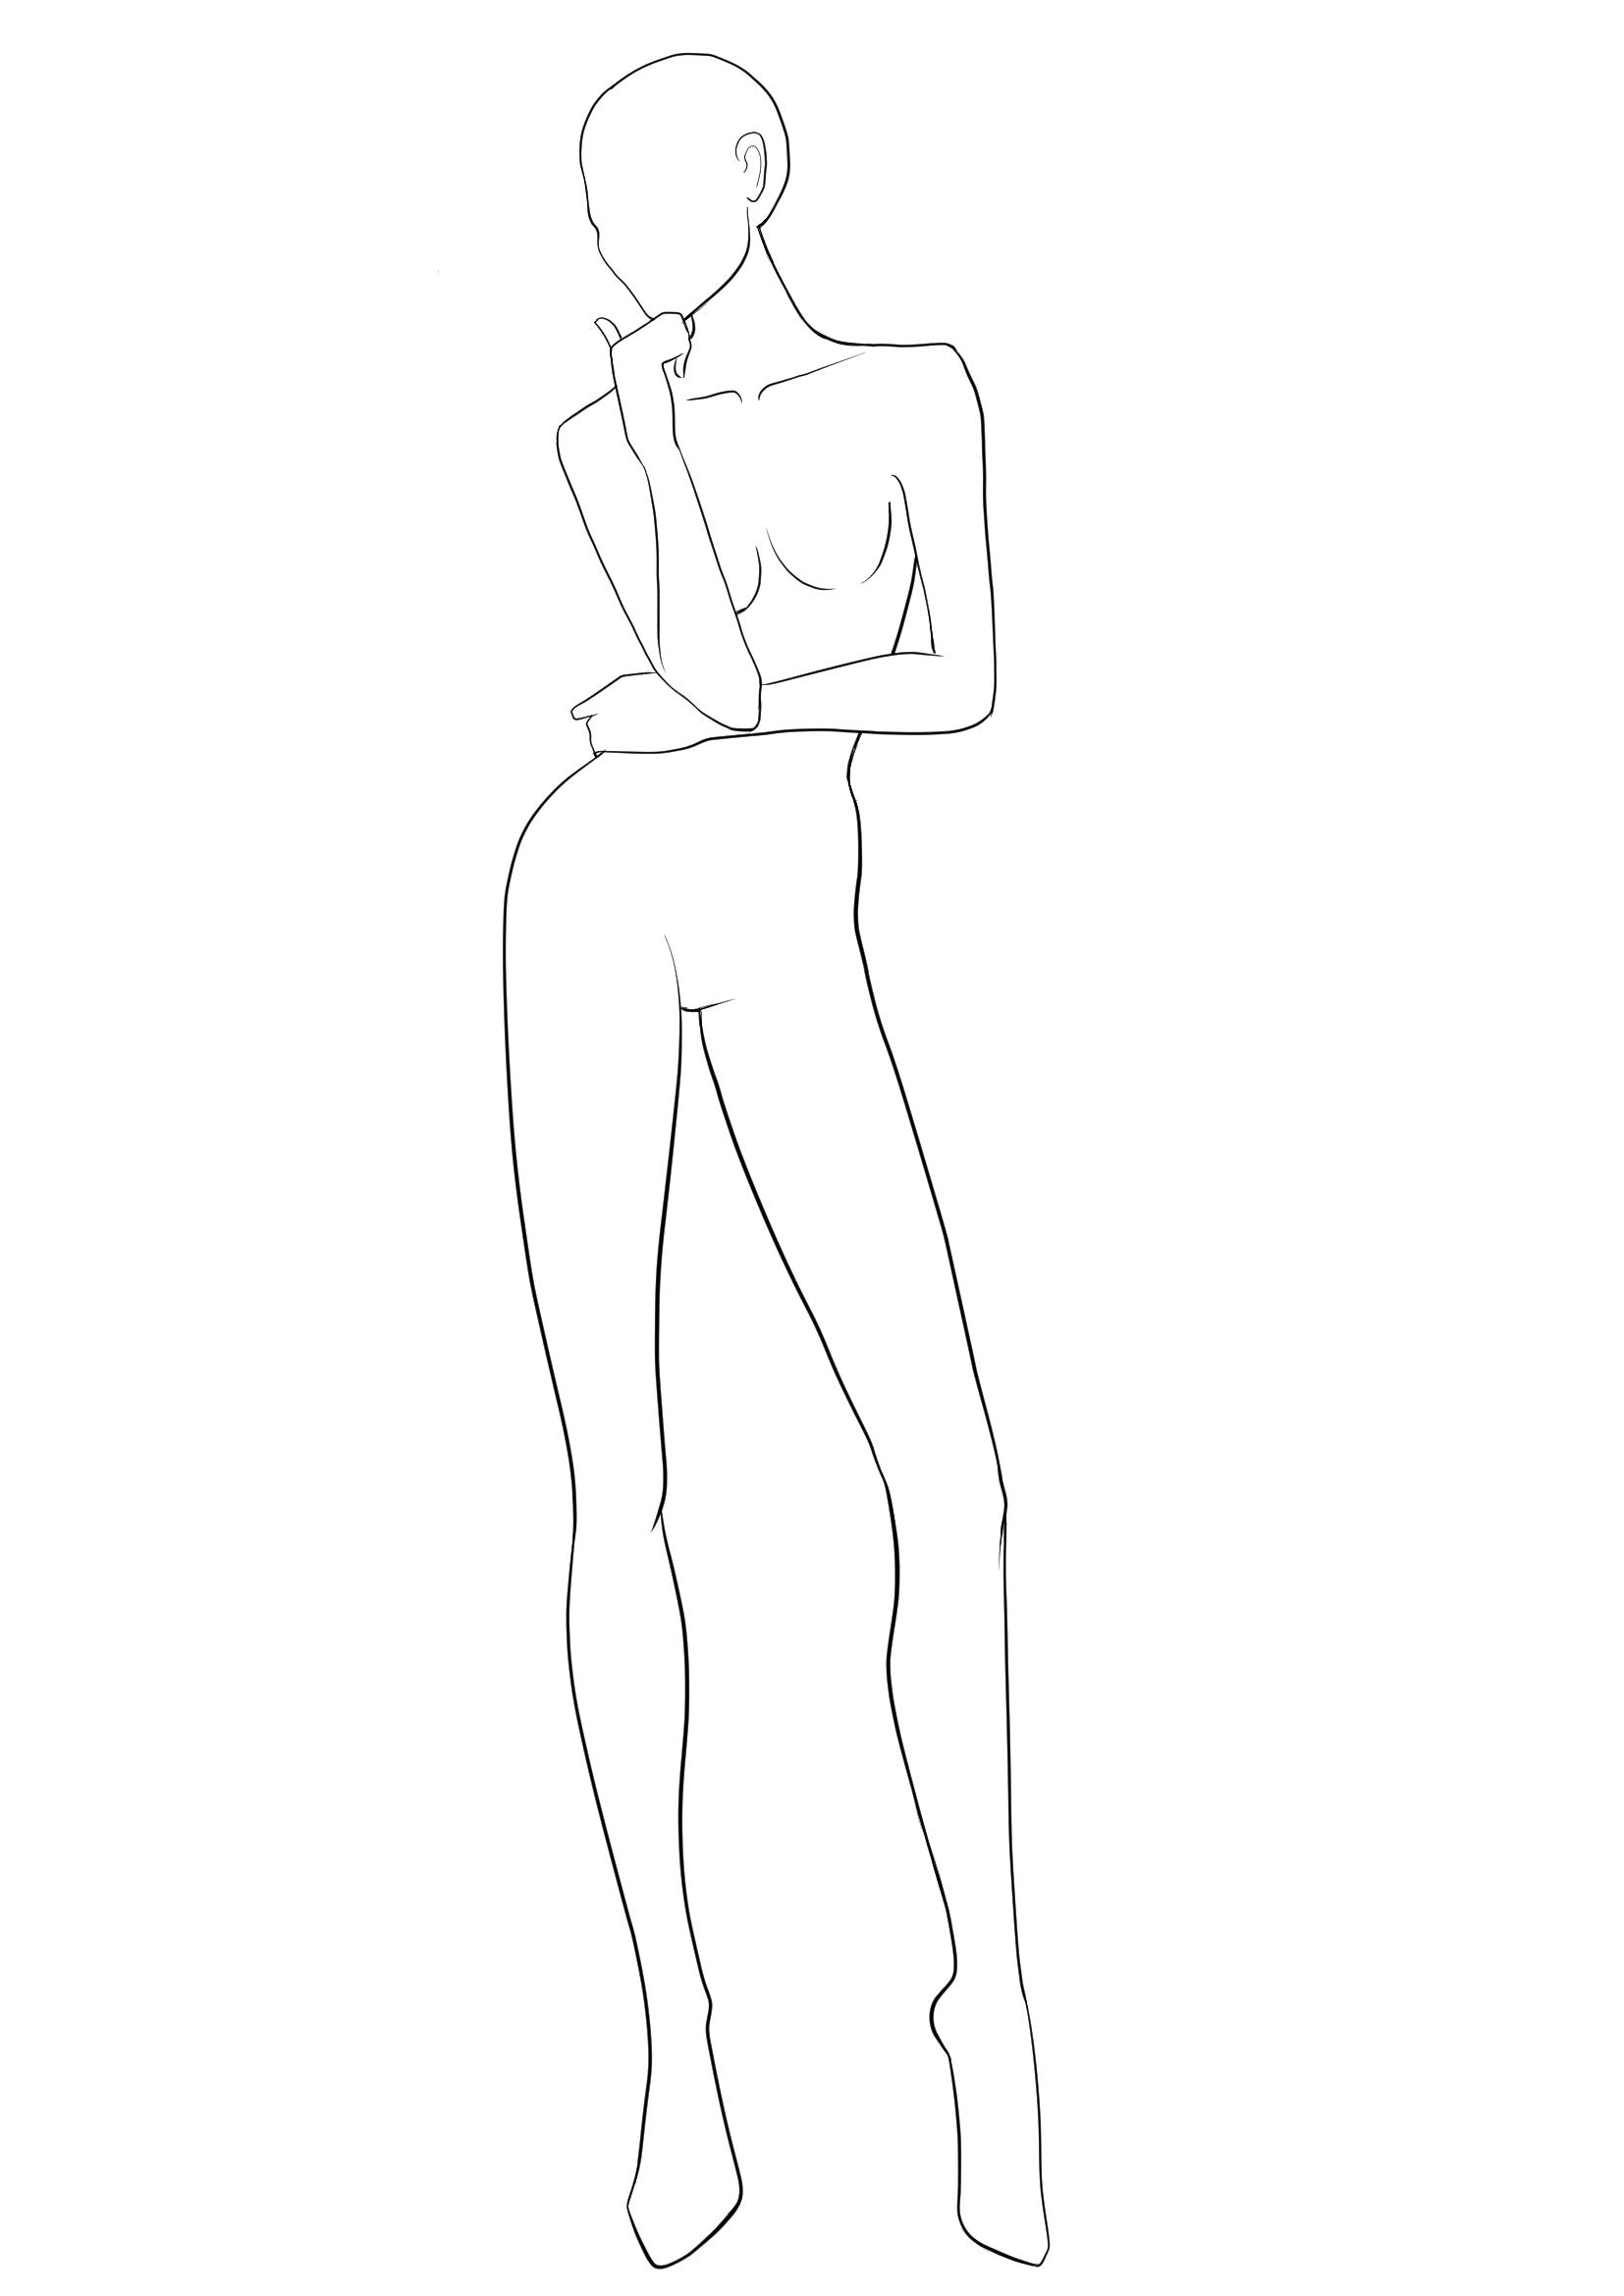 Free Fashion Templates Croquis I Draw Fashion Fashion Illustration Poses Fashion Figure Templates Fashion Figure Drawing